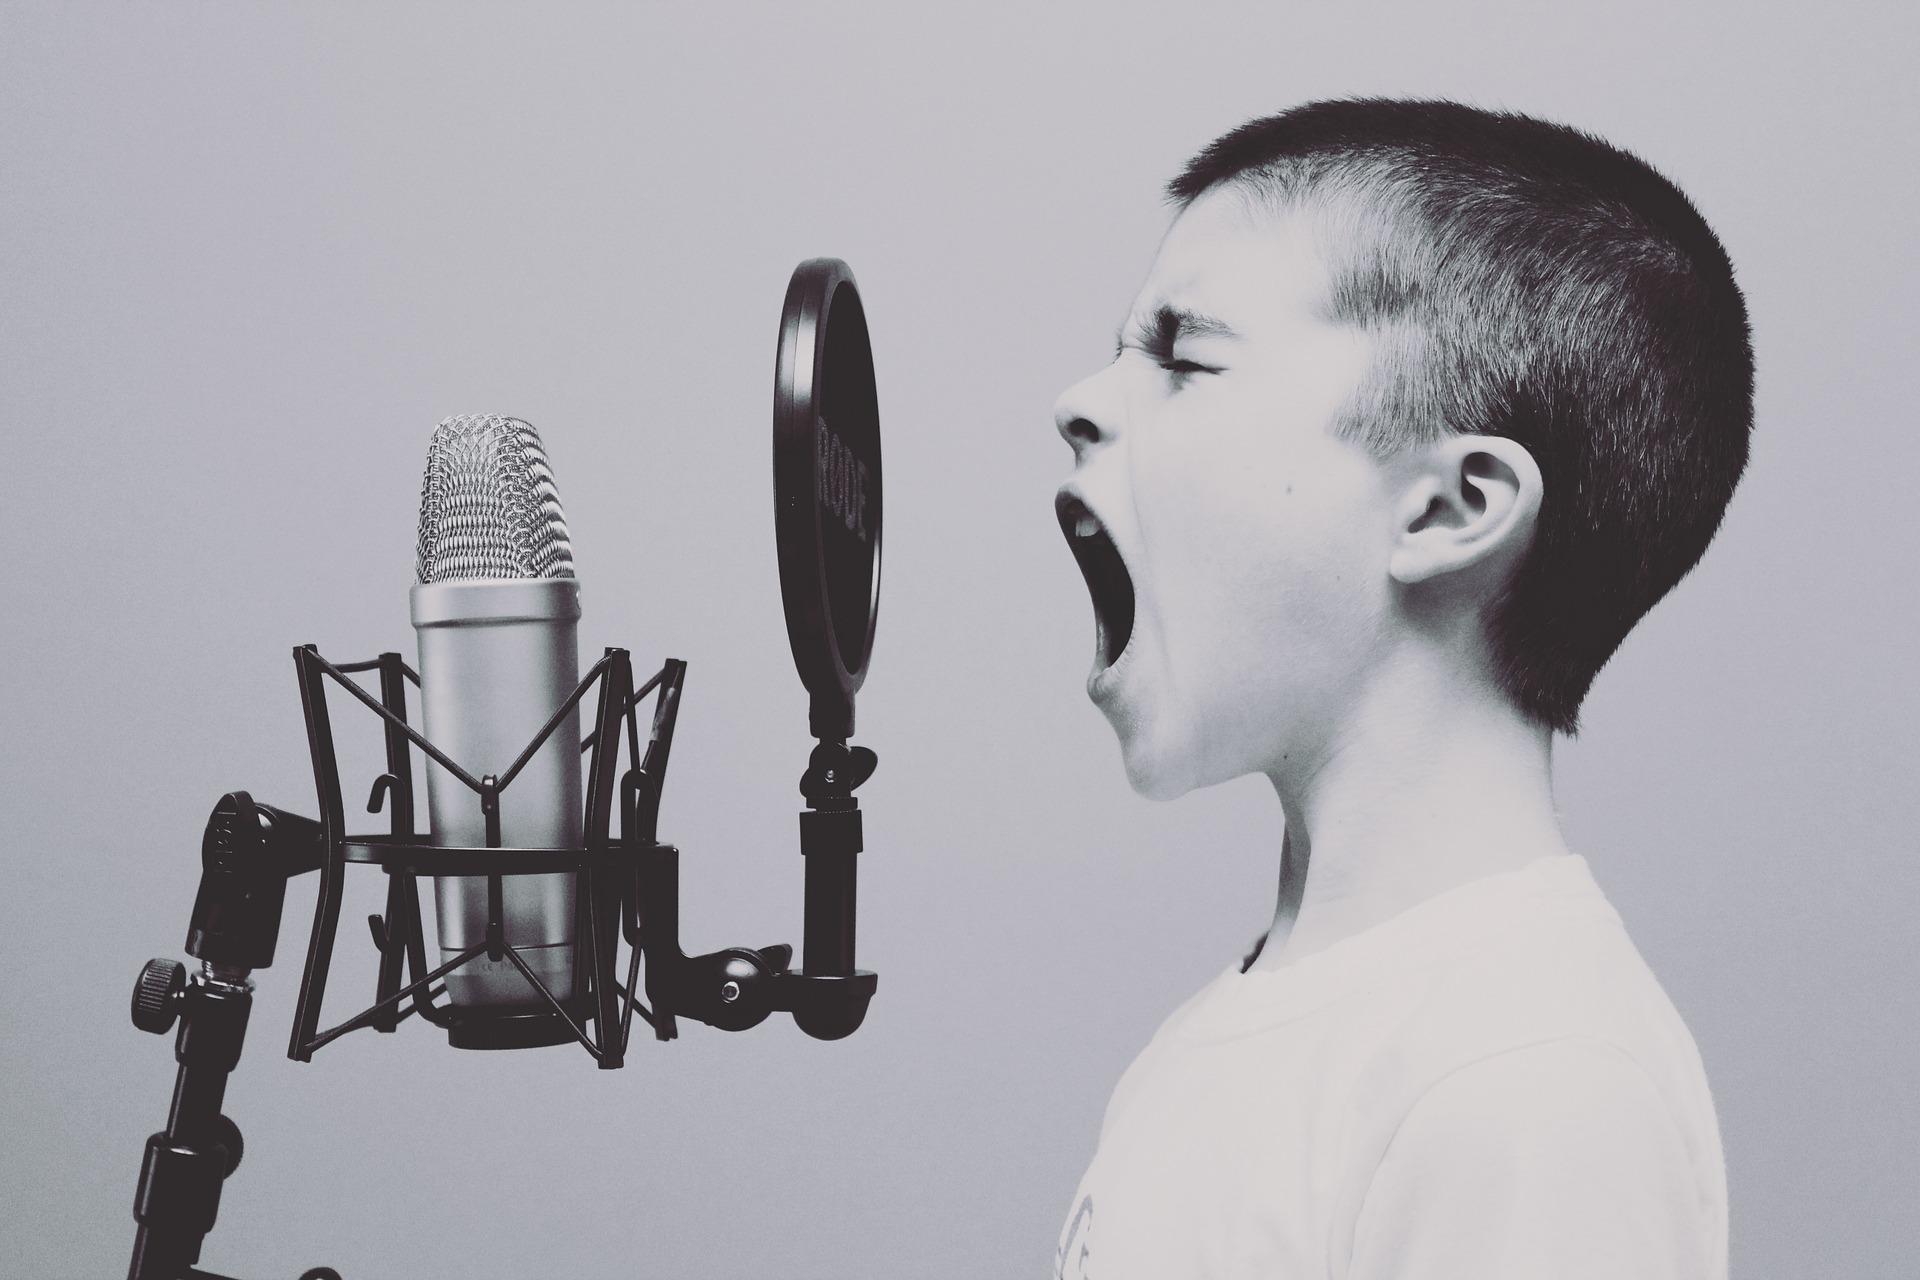 microphone-1209816_1920.jpg